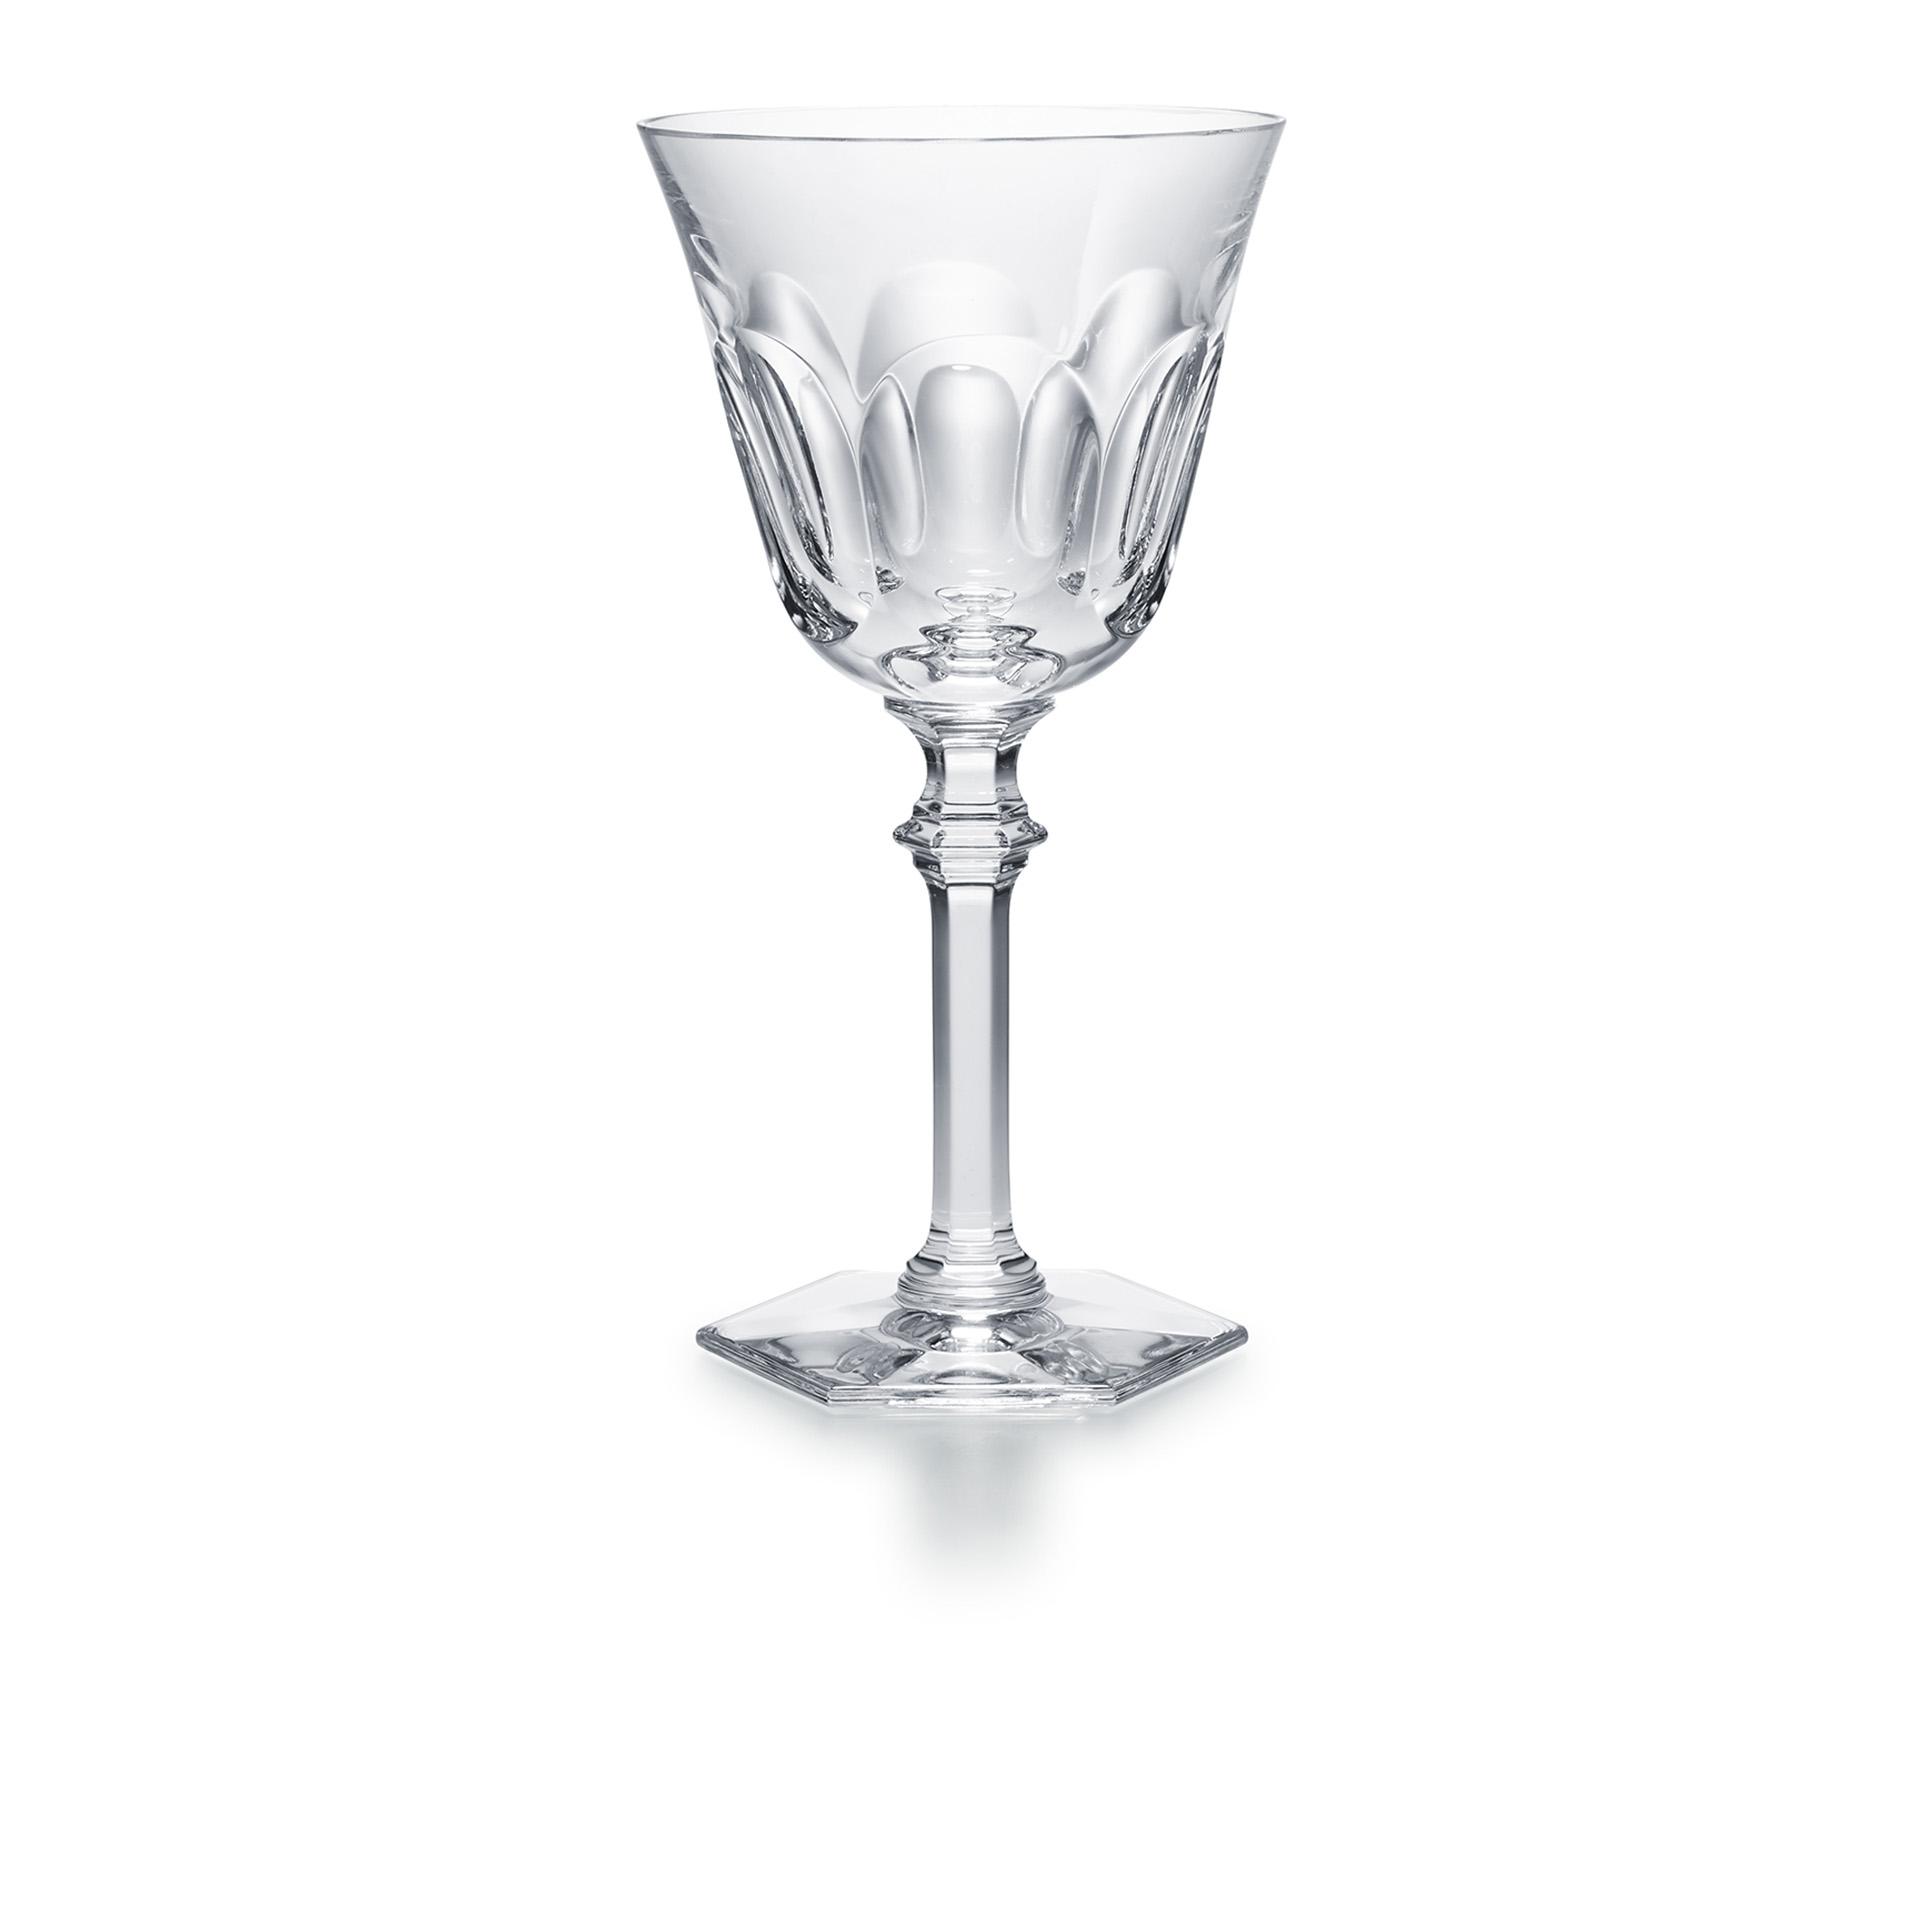 Harcourt Eve Glass - Baccarat